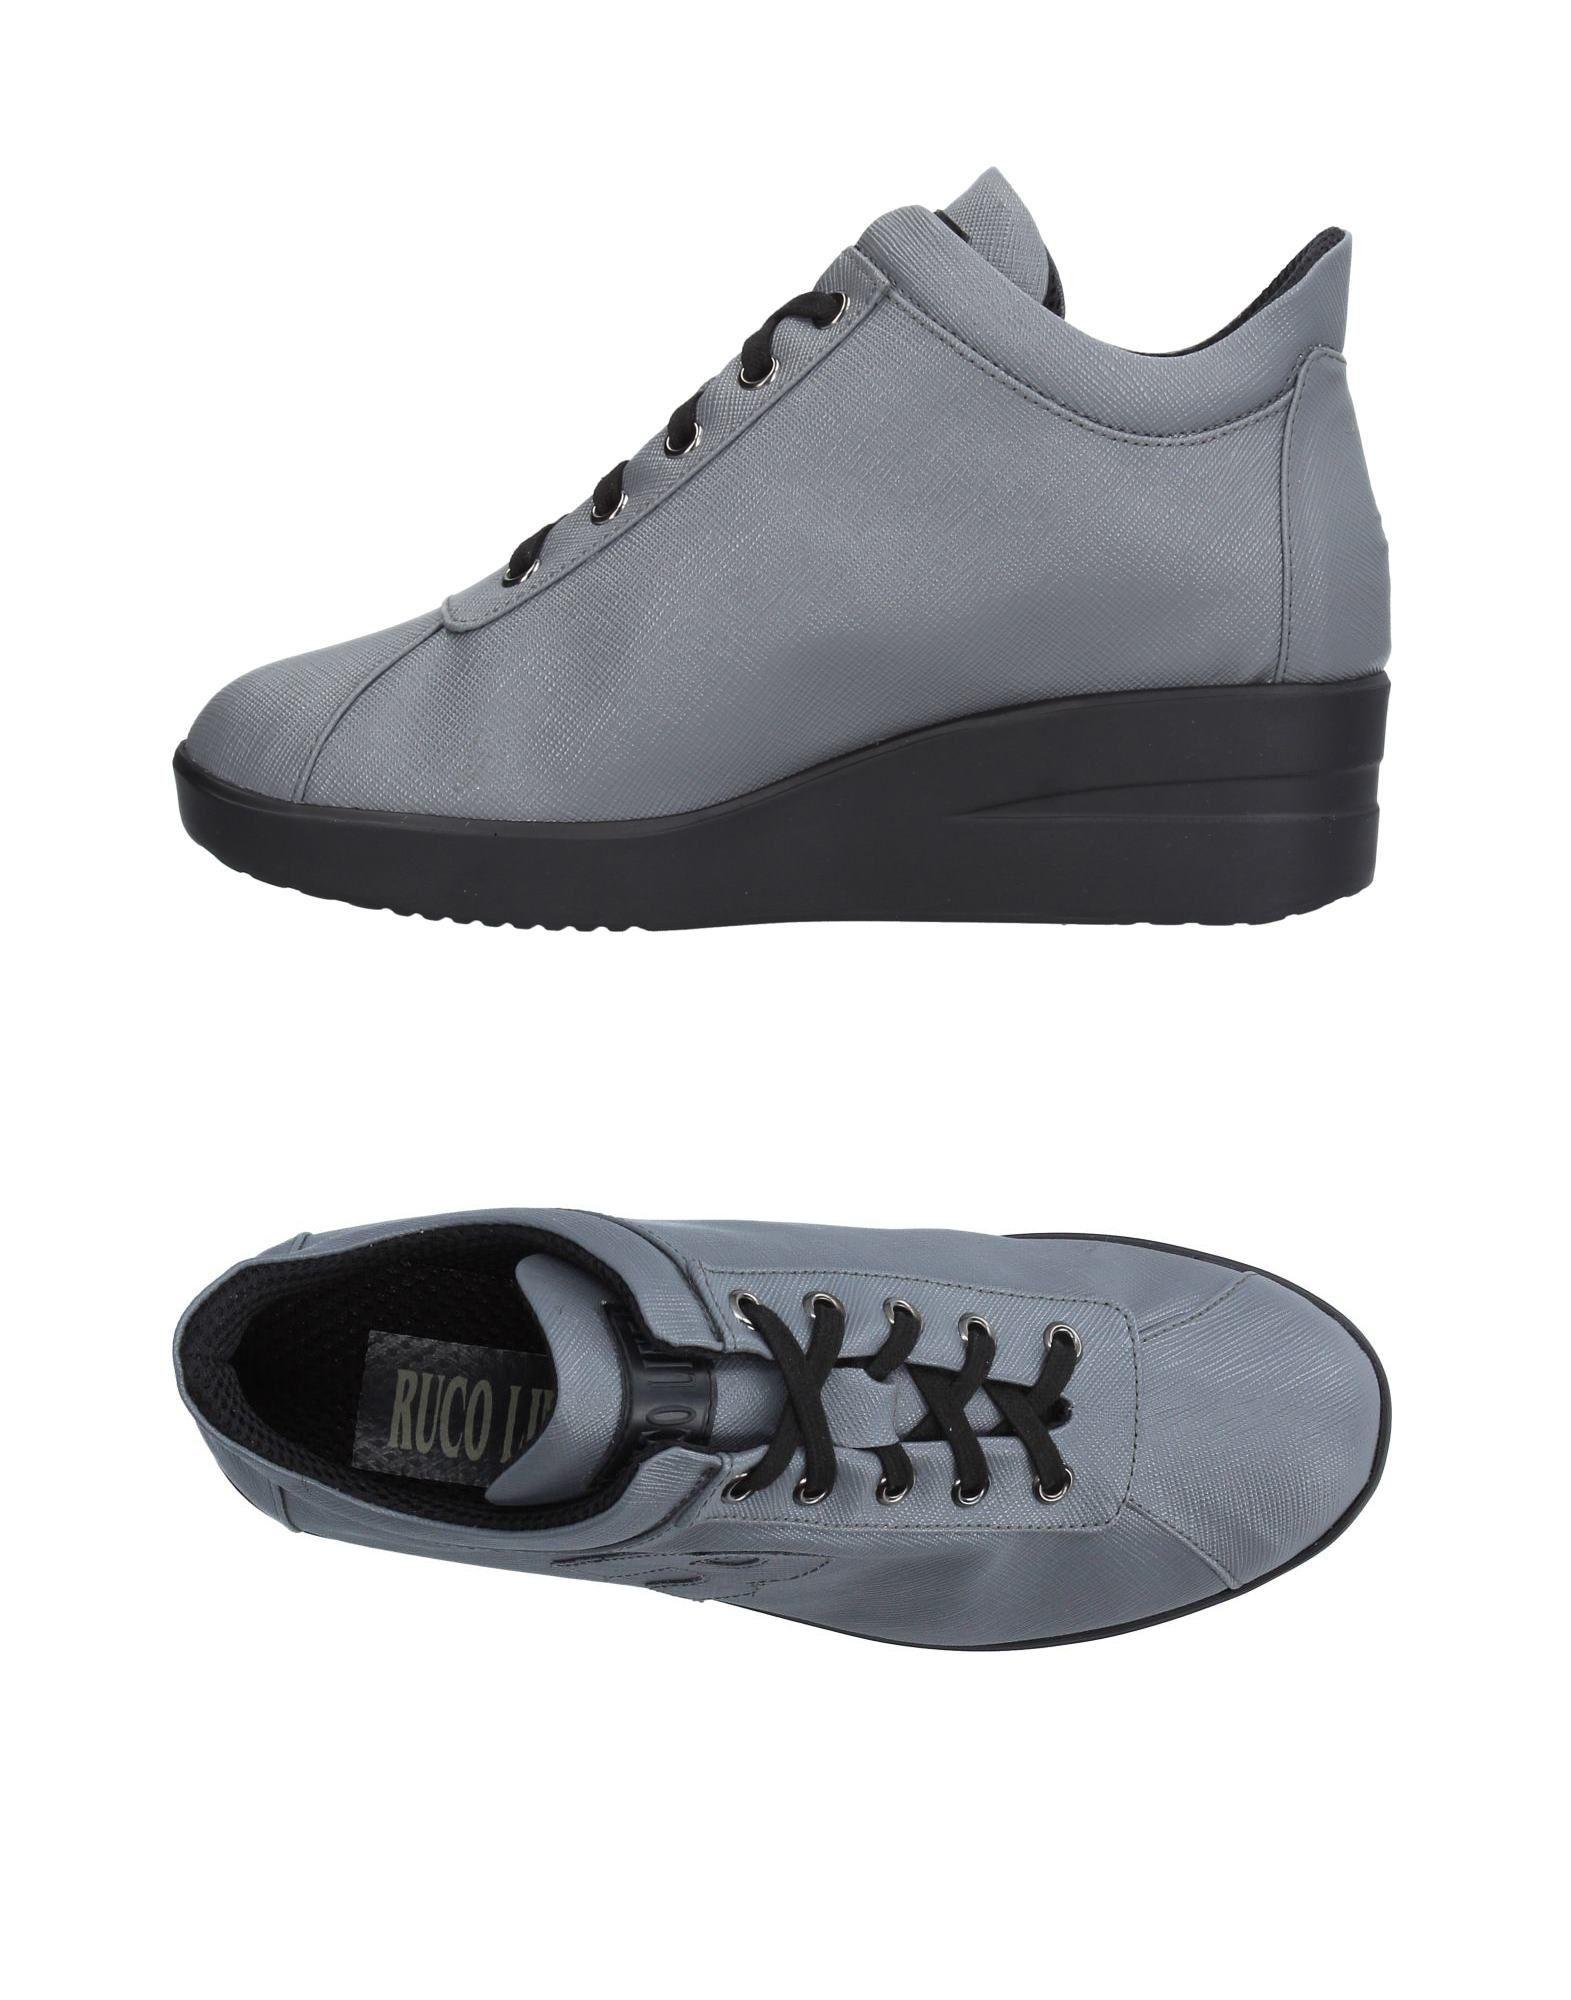 Ruco Line Sneakers - Women Women Women Ruco Line Sneakers online on  Canada - 11227686QT 2d97fc